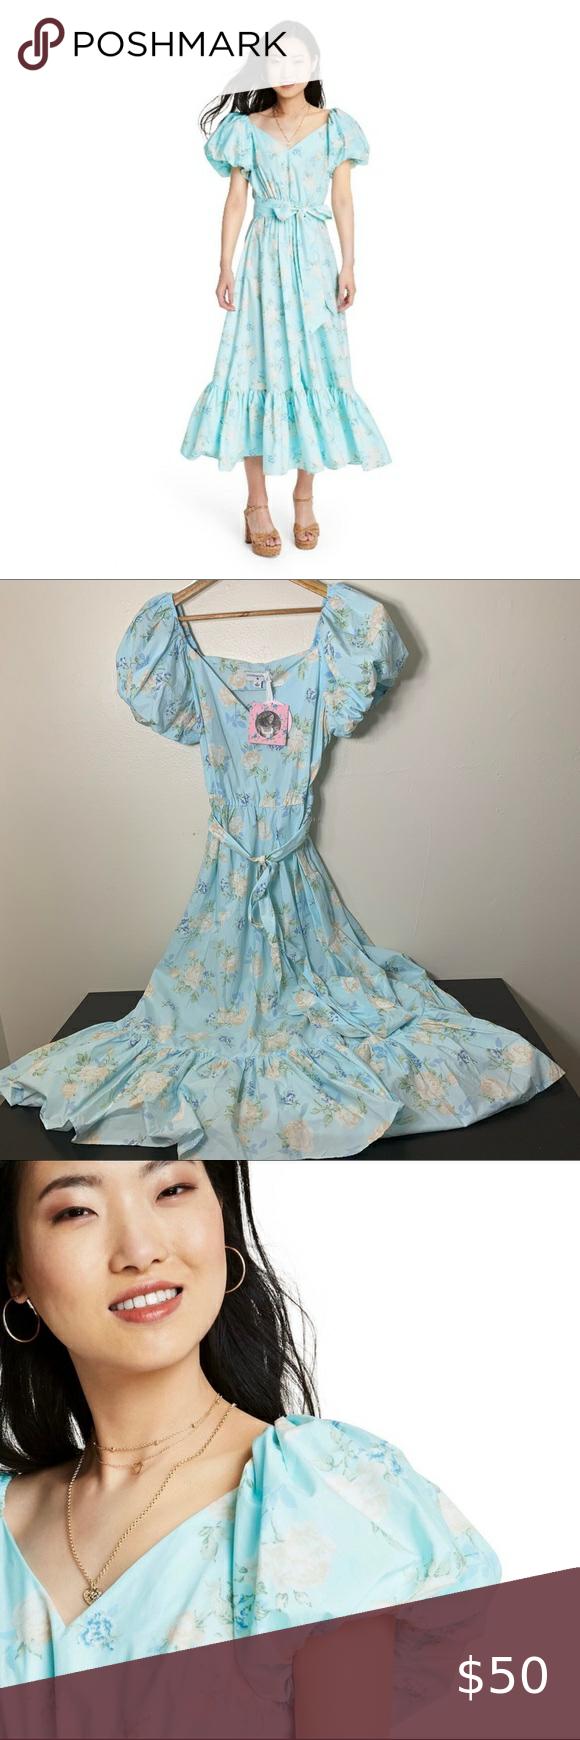 Loveshackfancy X Target Estelle Dress Sz 14 Estelle Dress Pale Blue Floral Dress Puff Sleeve Dresses [ 1740 x 580 Pixel ]